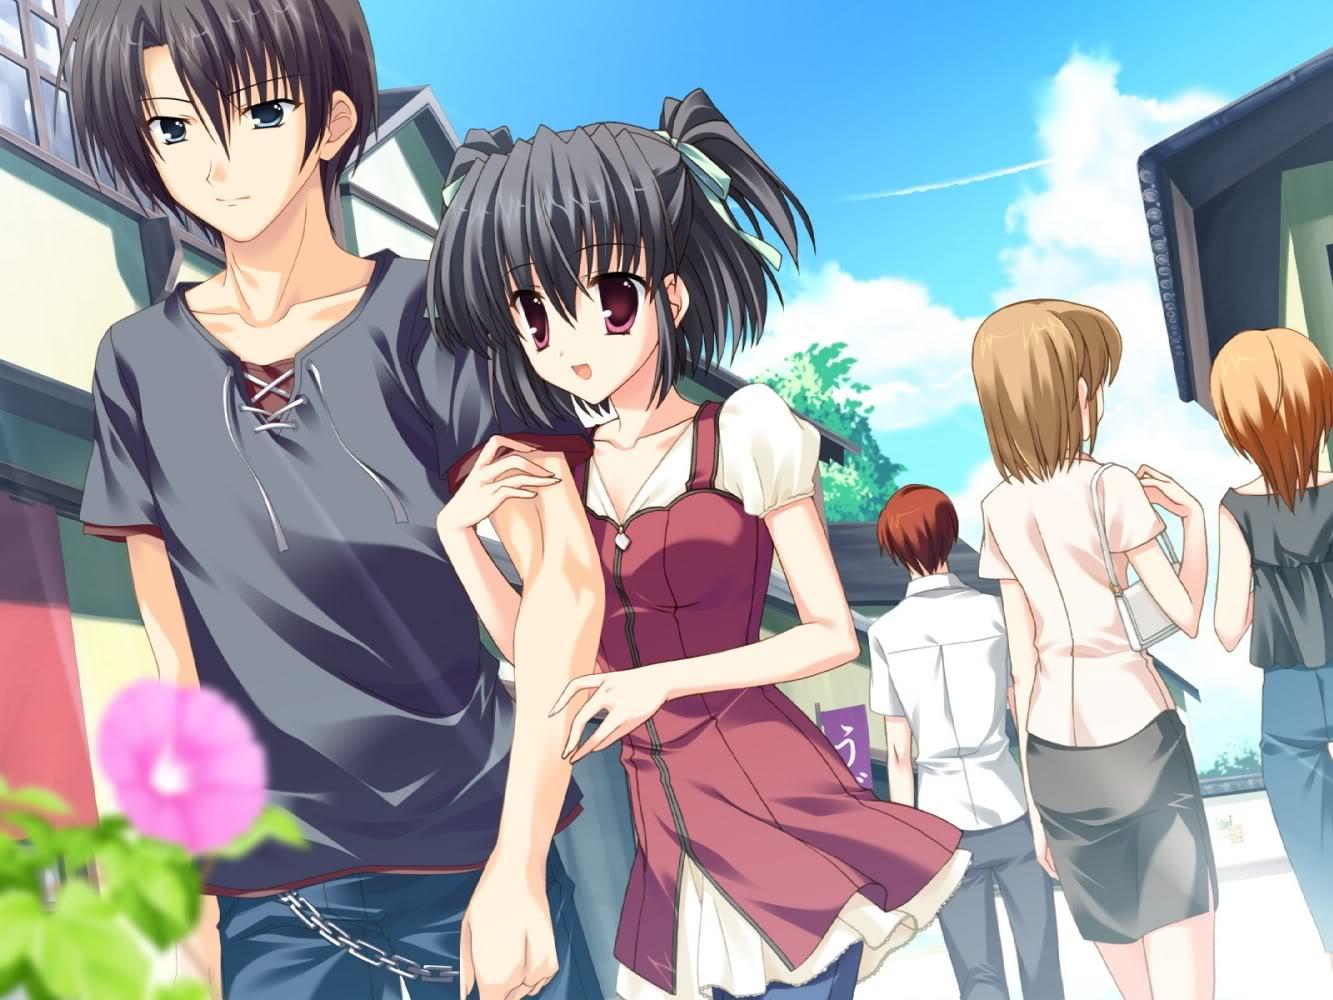 America gods anime 39 s best anime couple - Anime couple pictures ...